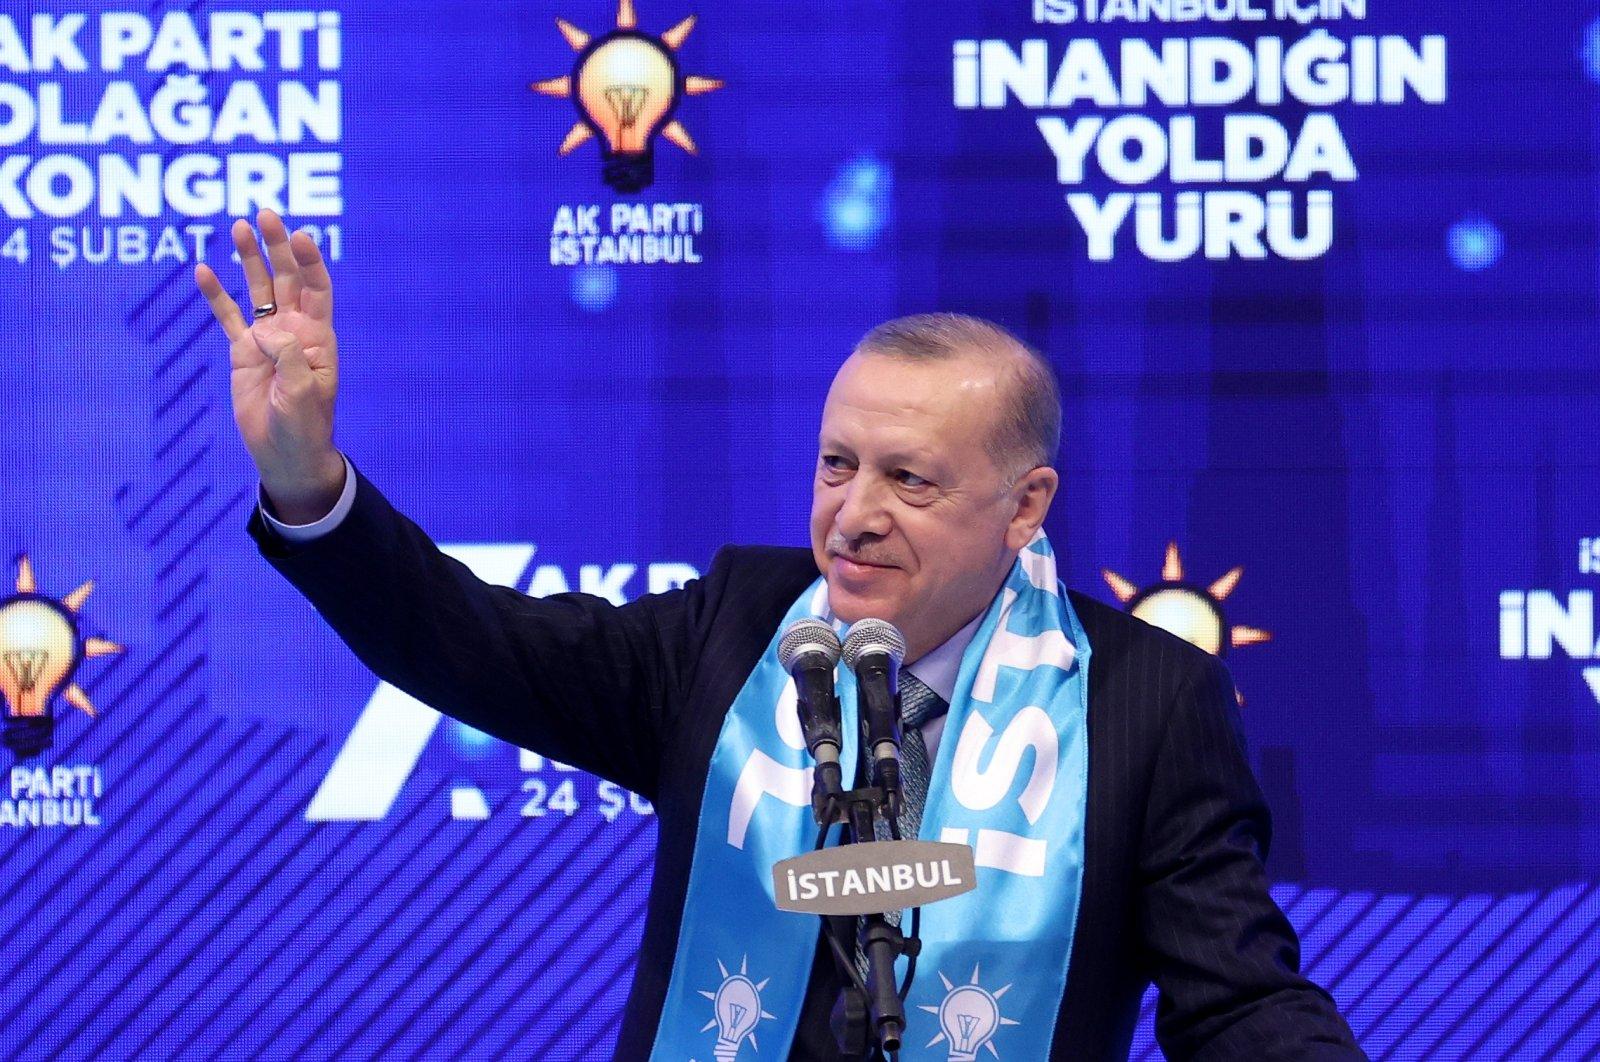 President Recep Tayyip Erdoğan speaks at the 7th Istanbul Provincial Congress, Istanbul, Turkey, Feb. 24, 2021. (AA Photo)